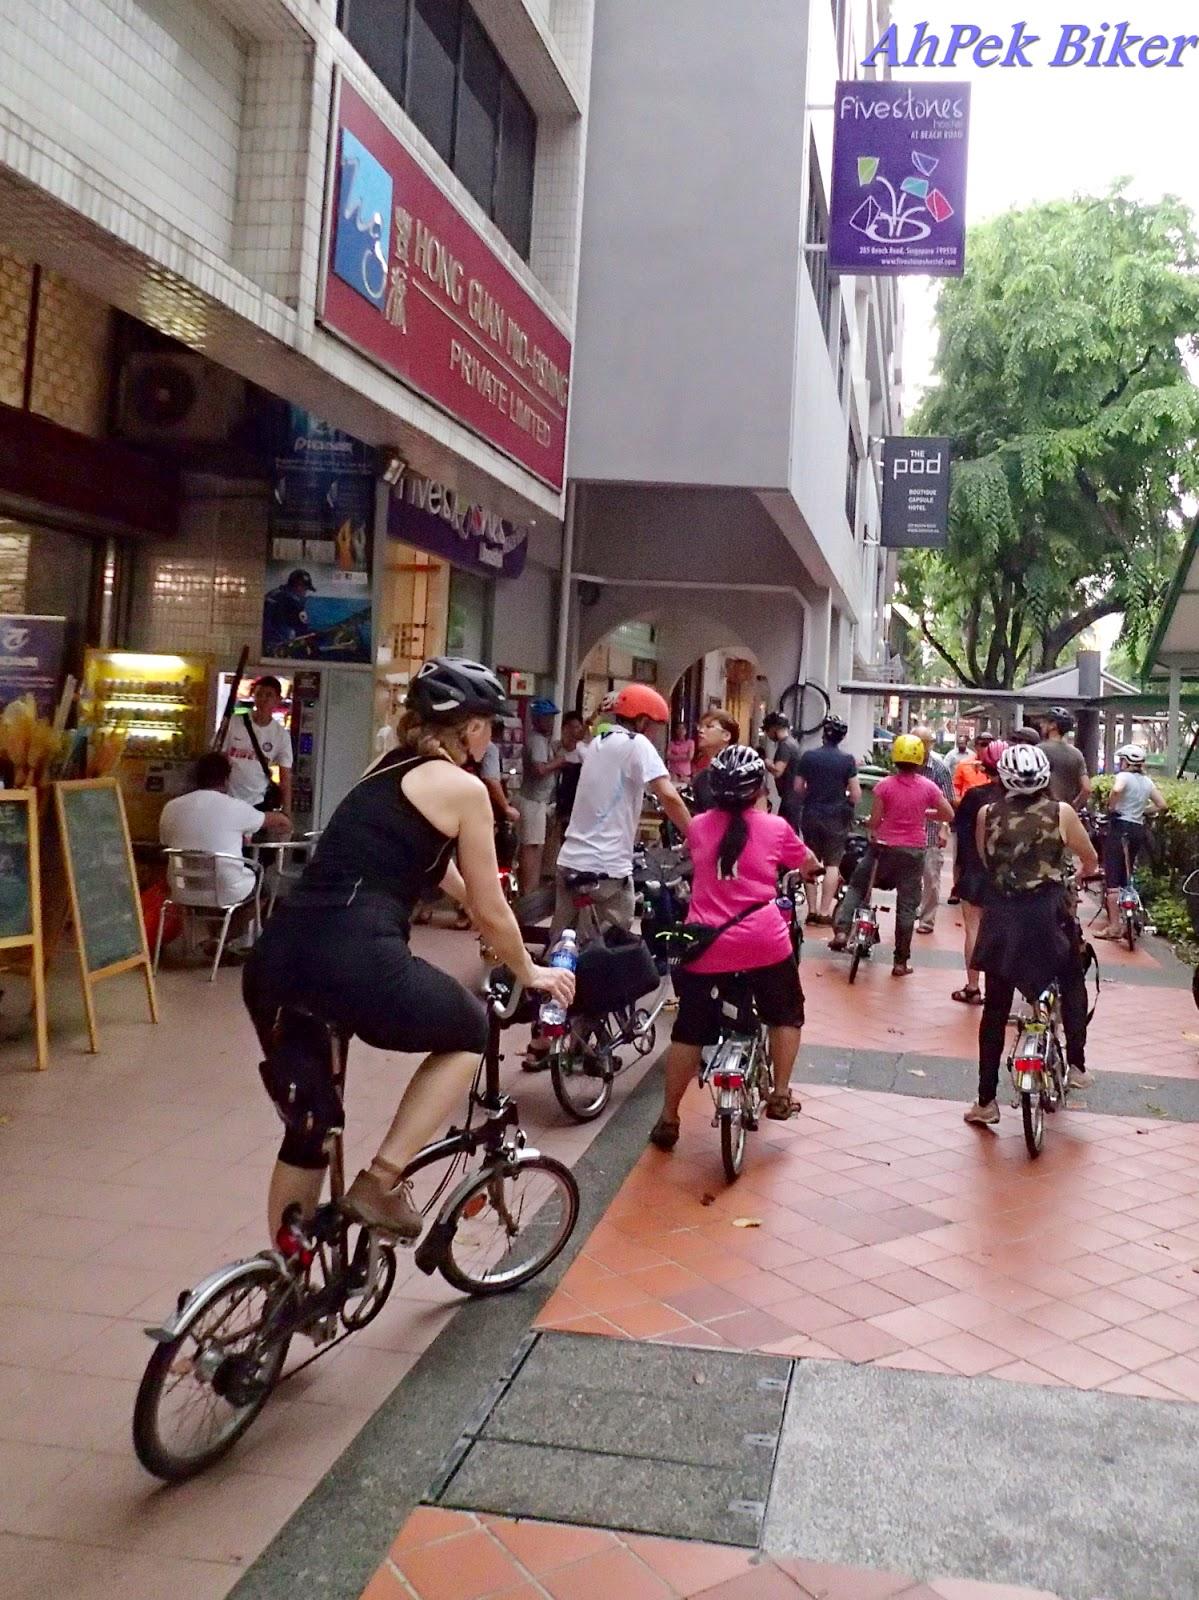 ahpek biker old dog rides again cycling singapore 2015 day 1